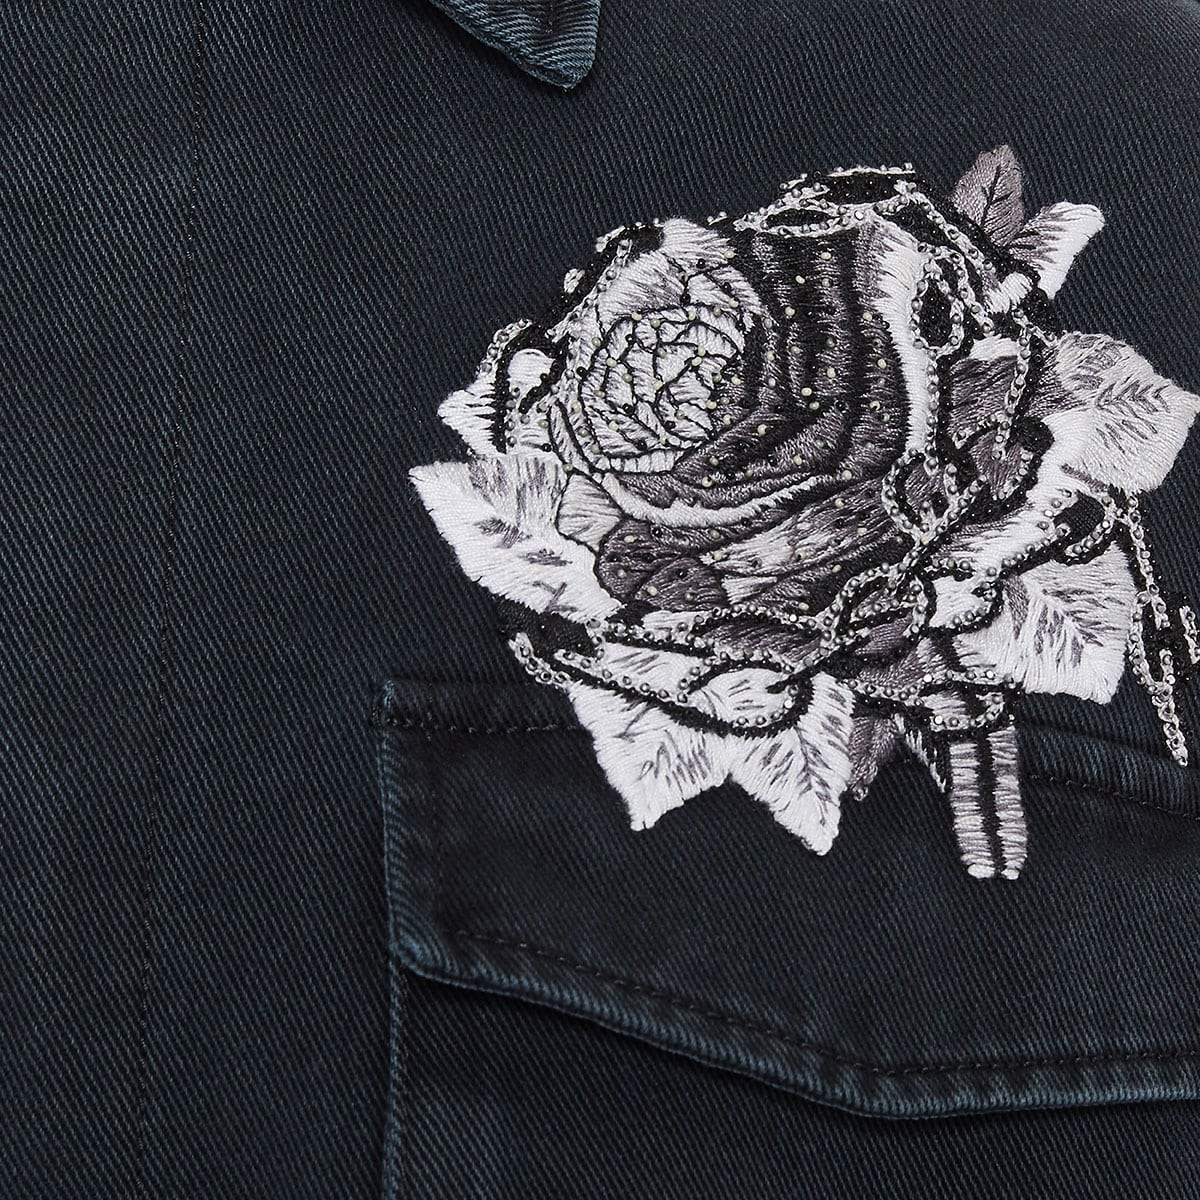 x Undercover embroidered denim overshirt